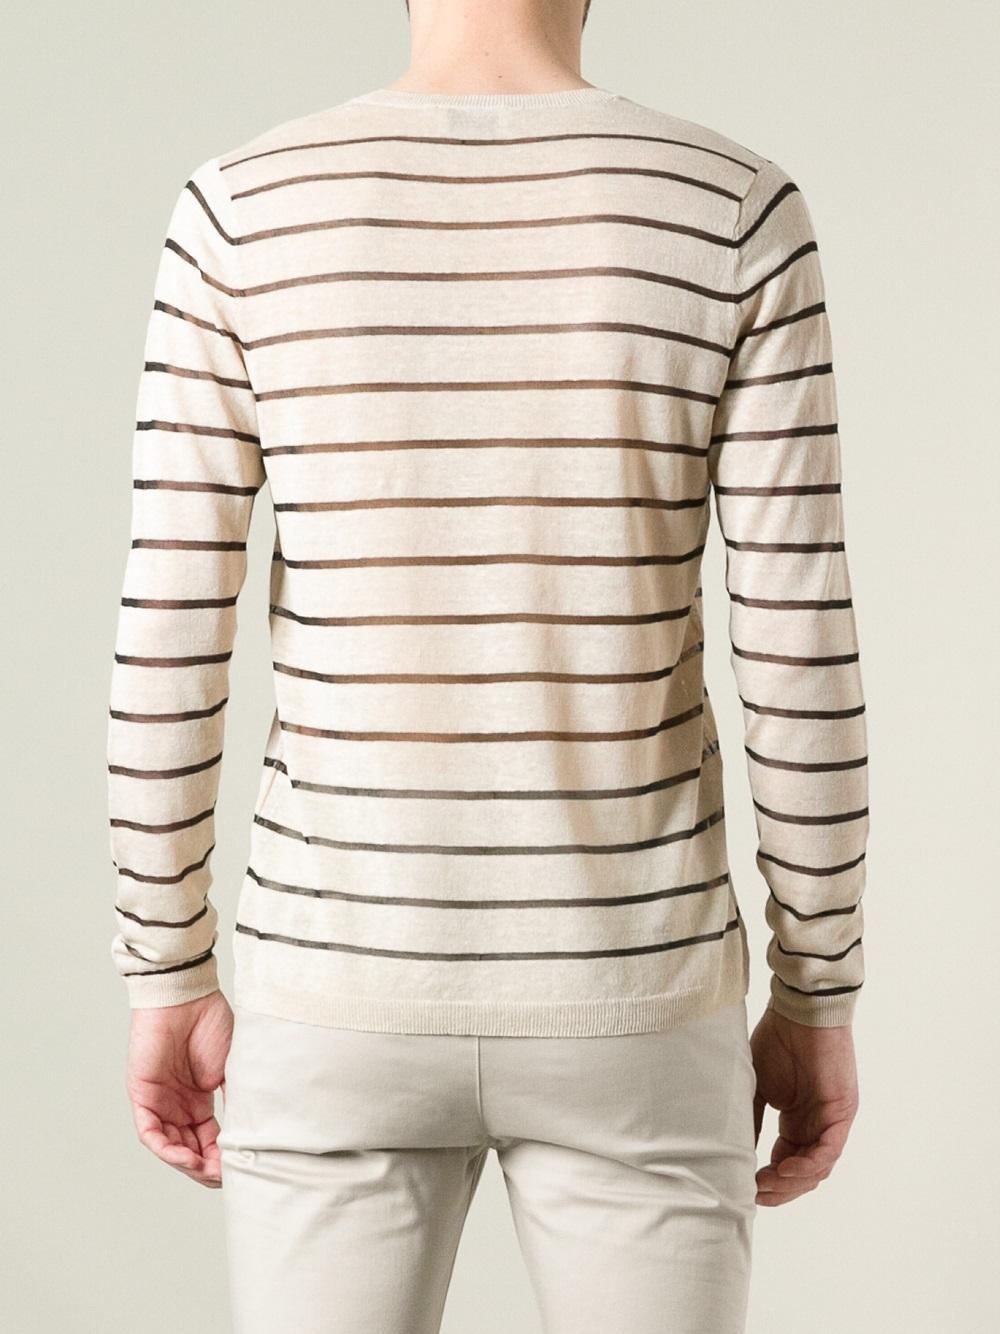 Acne Studios Striped Sweater in Natural for Men